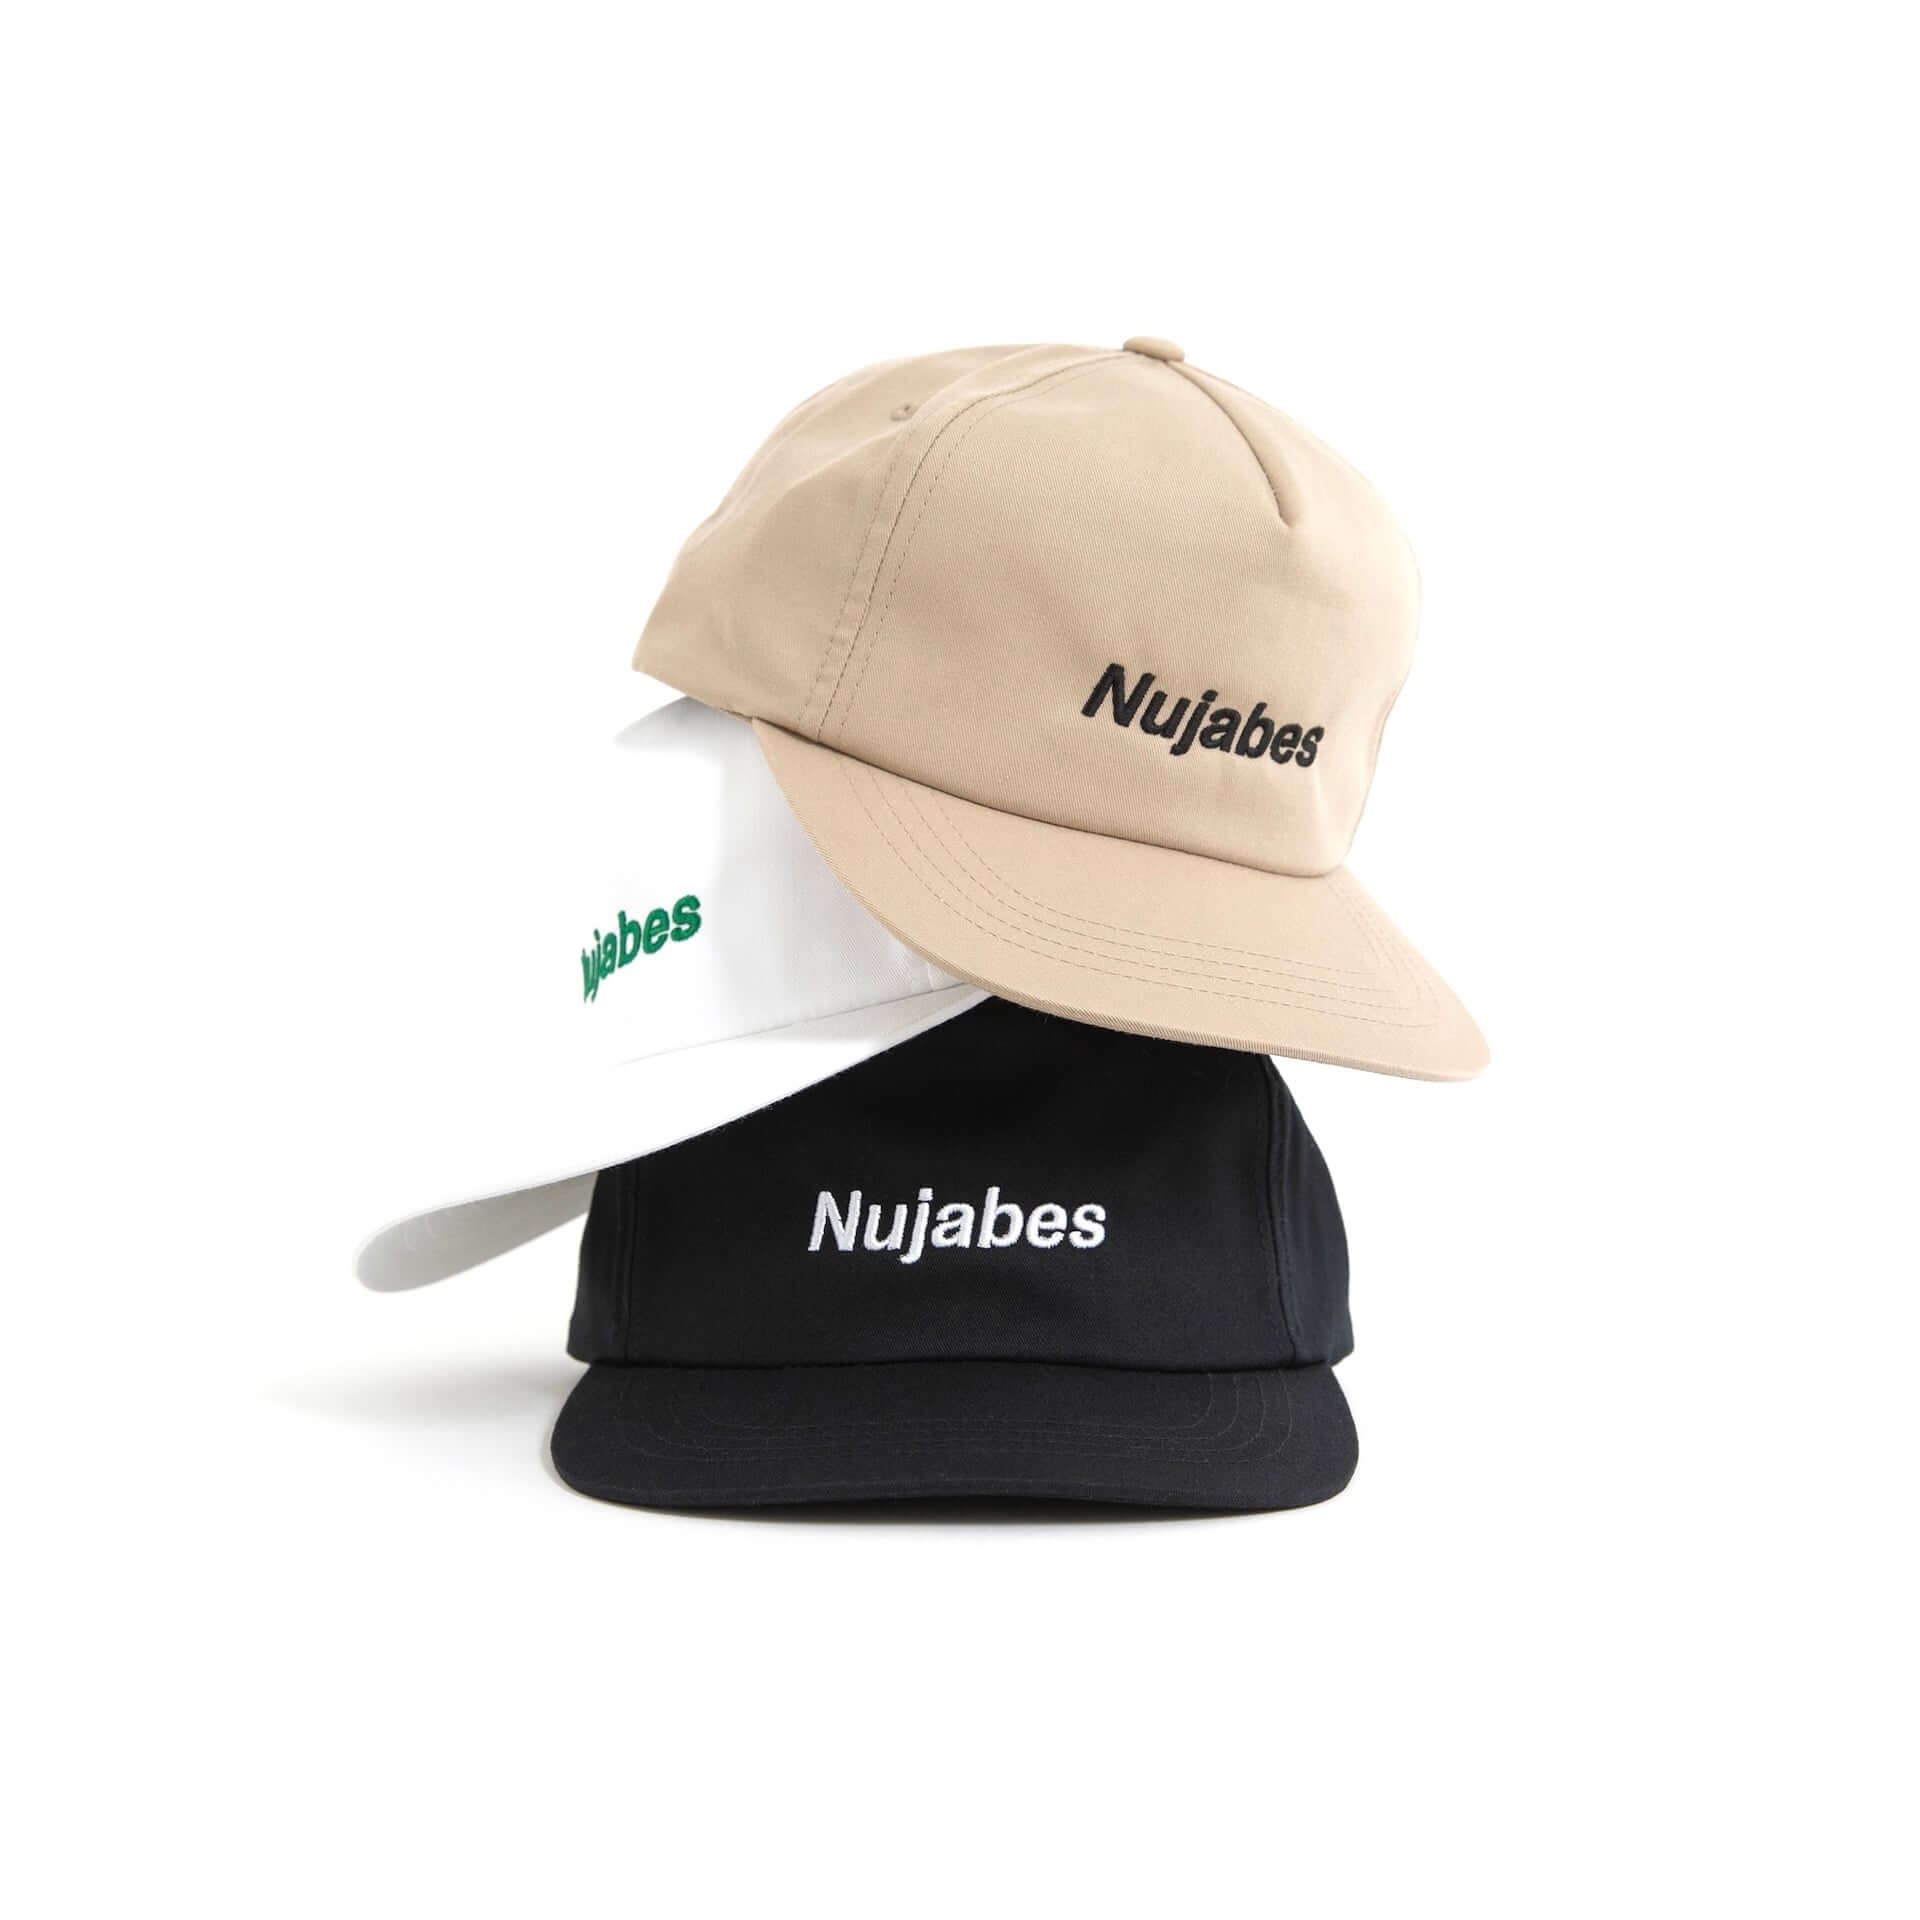 Nujabesの公式ポップアップが「YEN TOWN MARKET」公式サイトにて開催決定!ジャケットデザインを採用したアパレル、雑貨など多数展開 lf200930_nujabes-popup_10-1920x1920